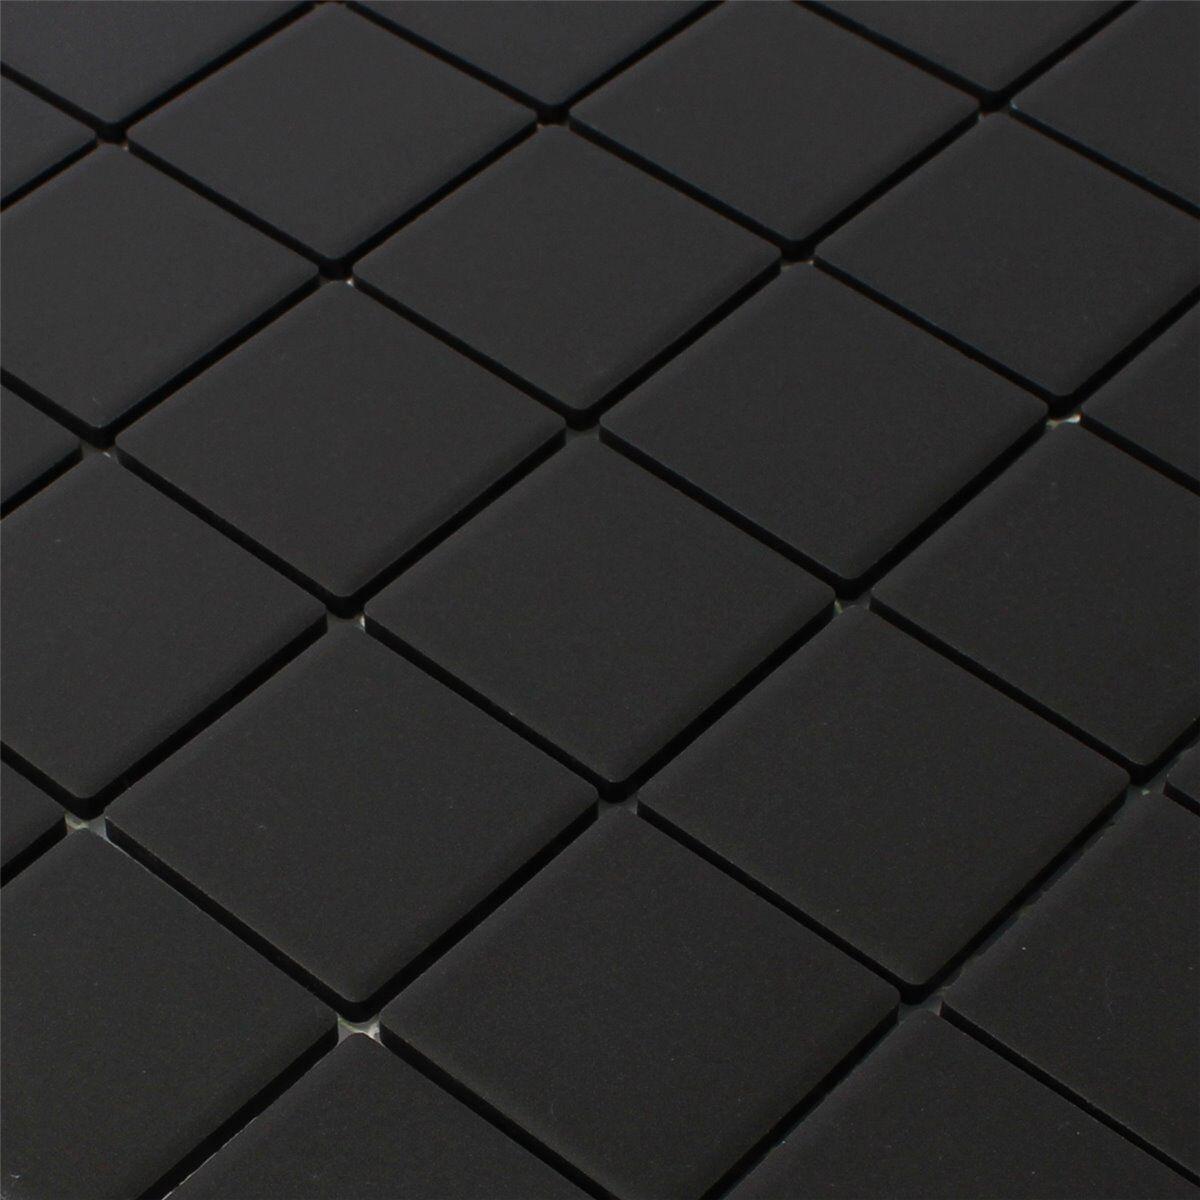 keramik mosaik fliesen schwarz uni rutschhemmend. Black Bedroom Furniture Sets. Home Design Ideas